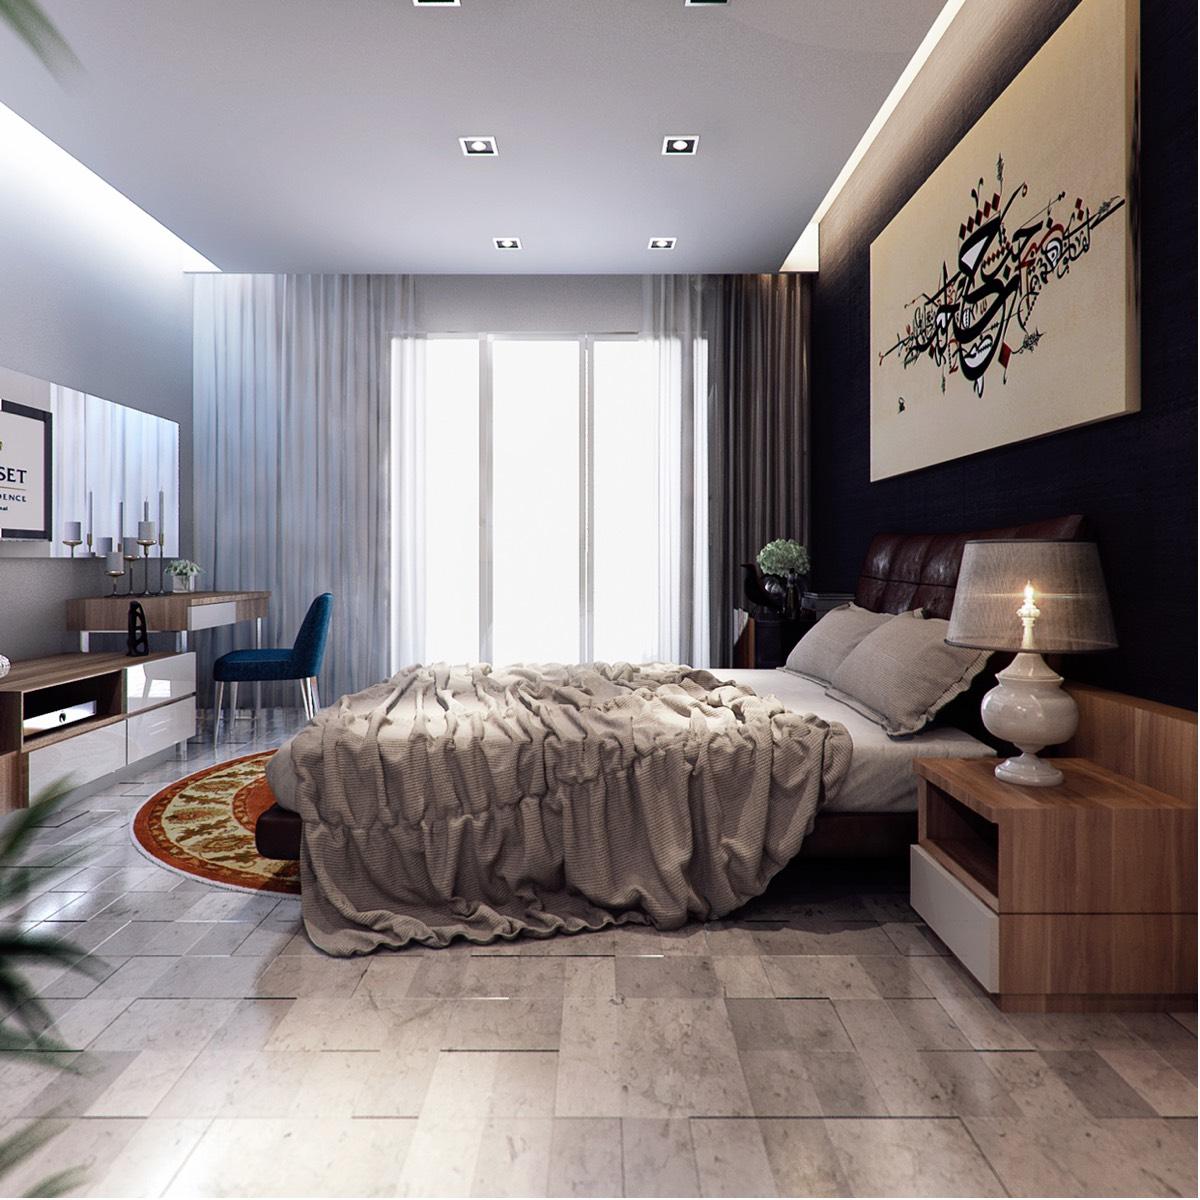 Vote February Room Finalists 2014: 10 Bedrooms For Designer Dreams